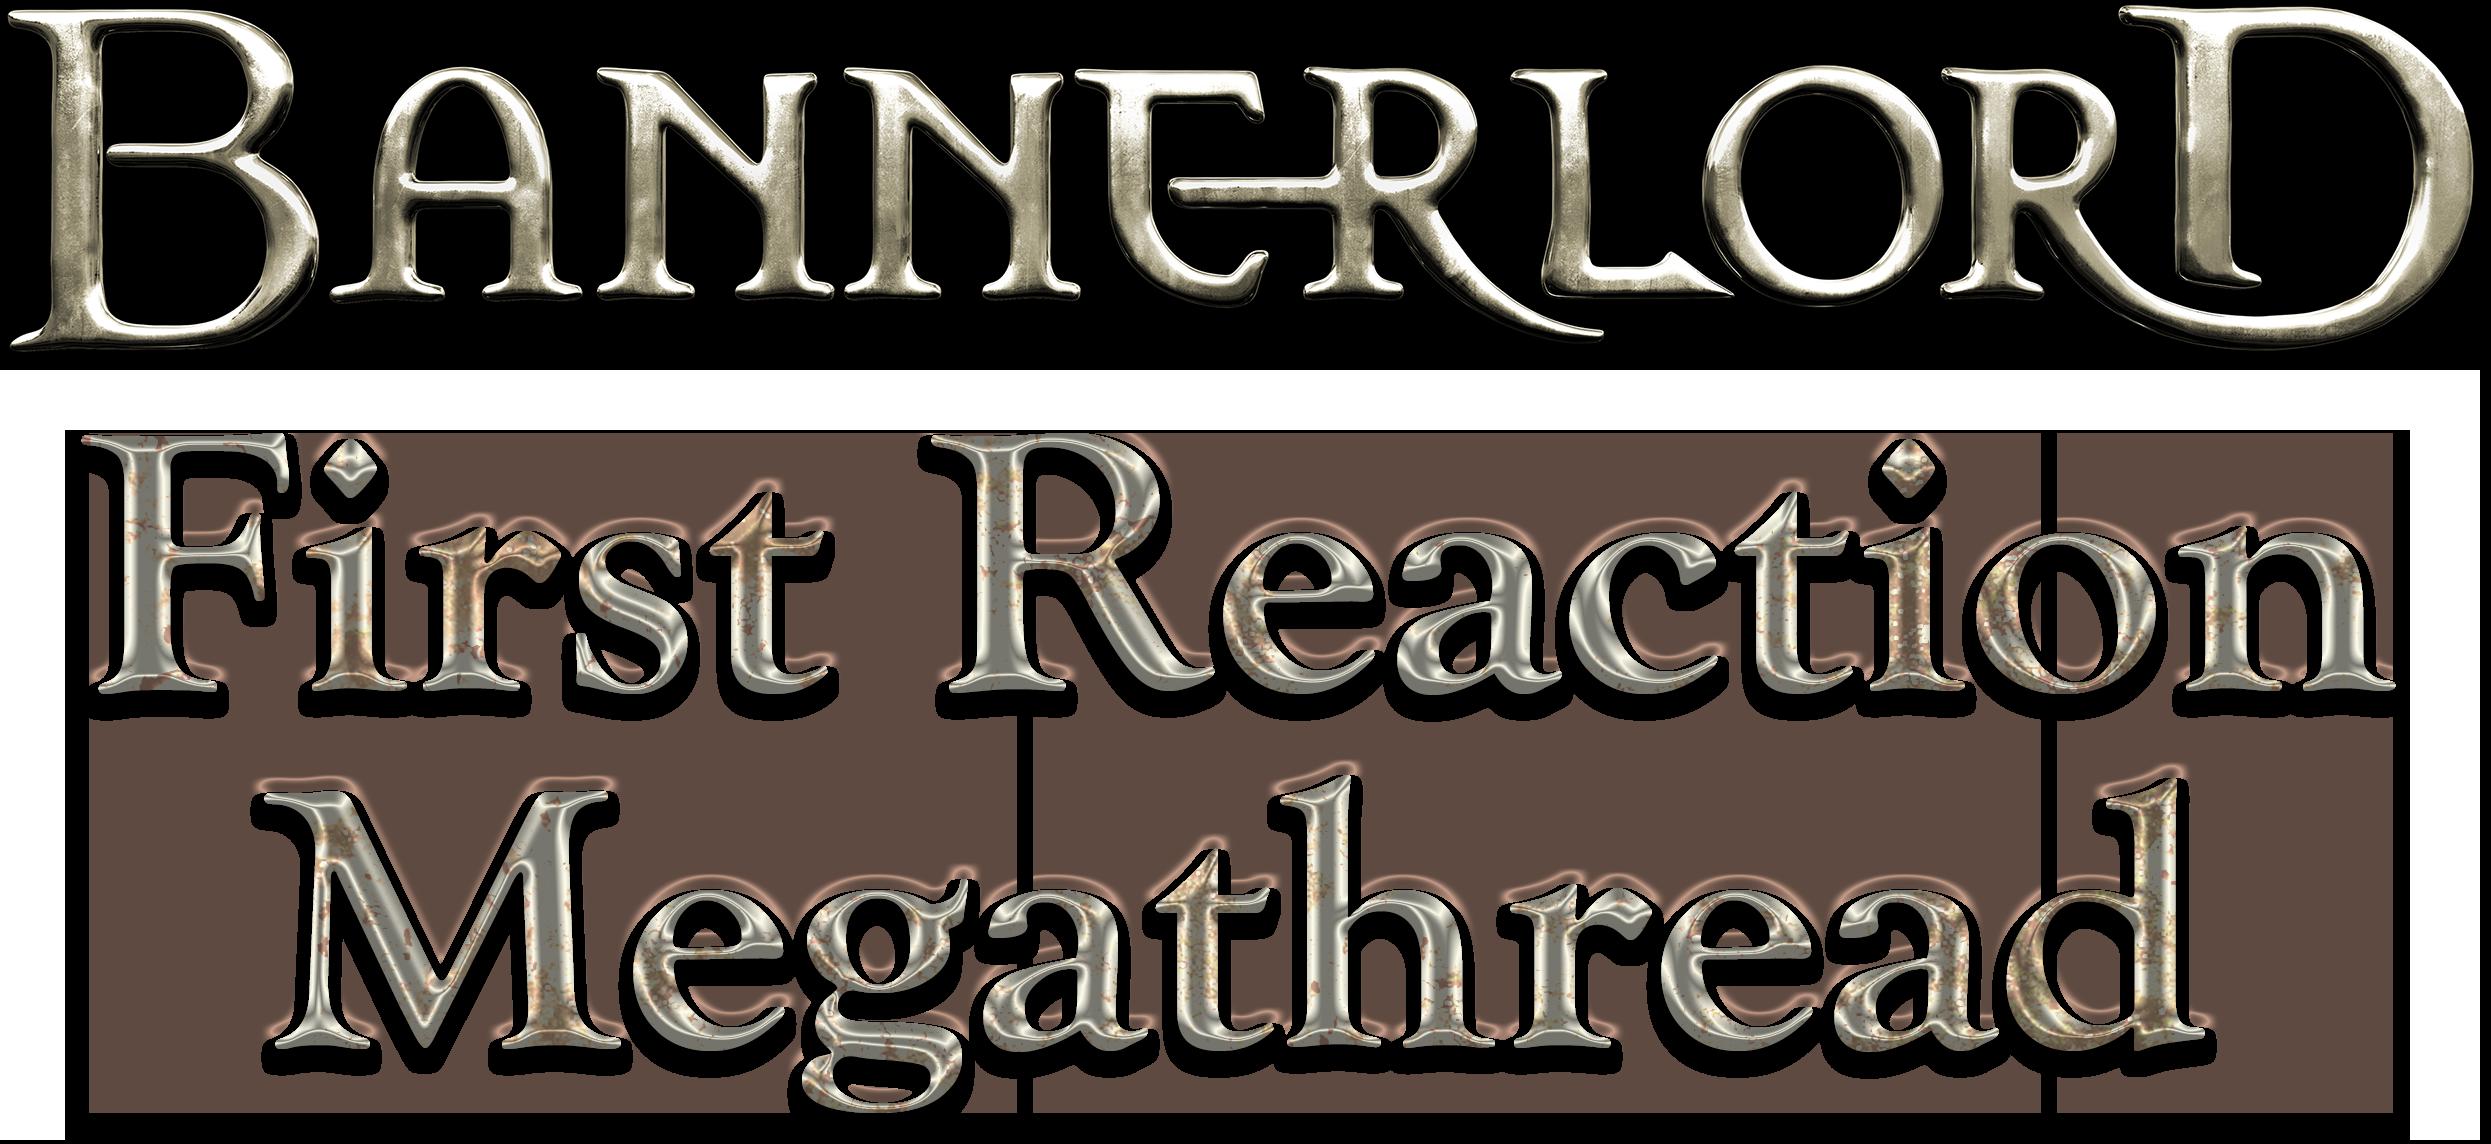 Megathread_txt.png